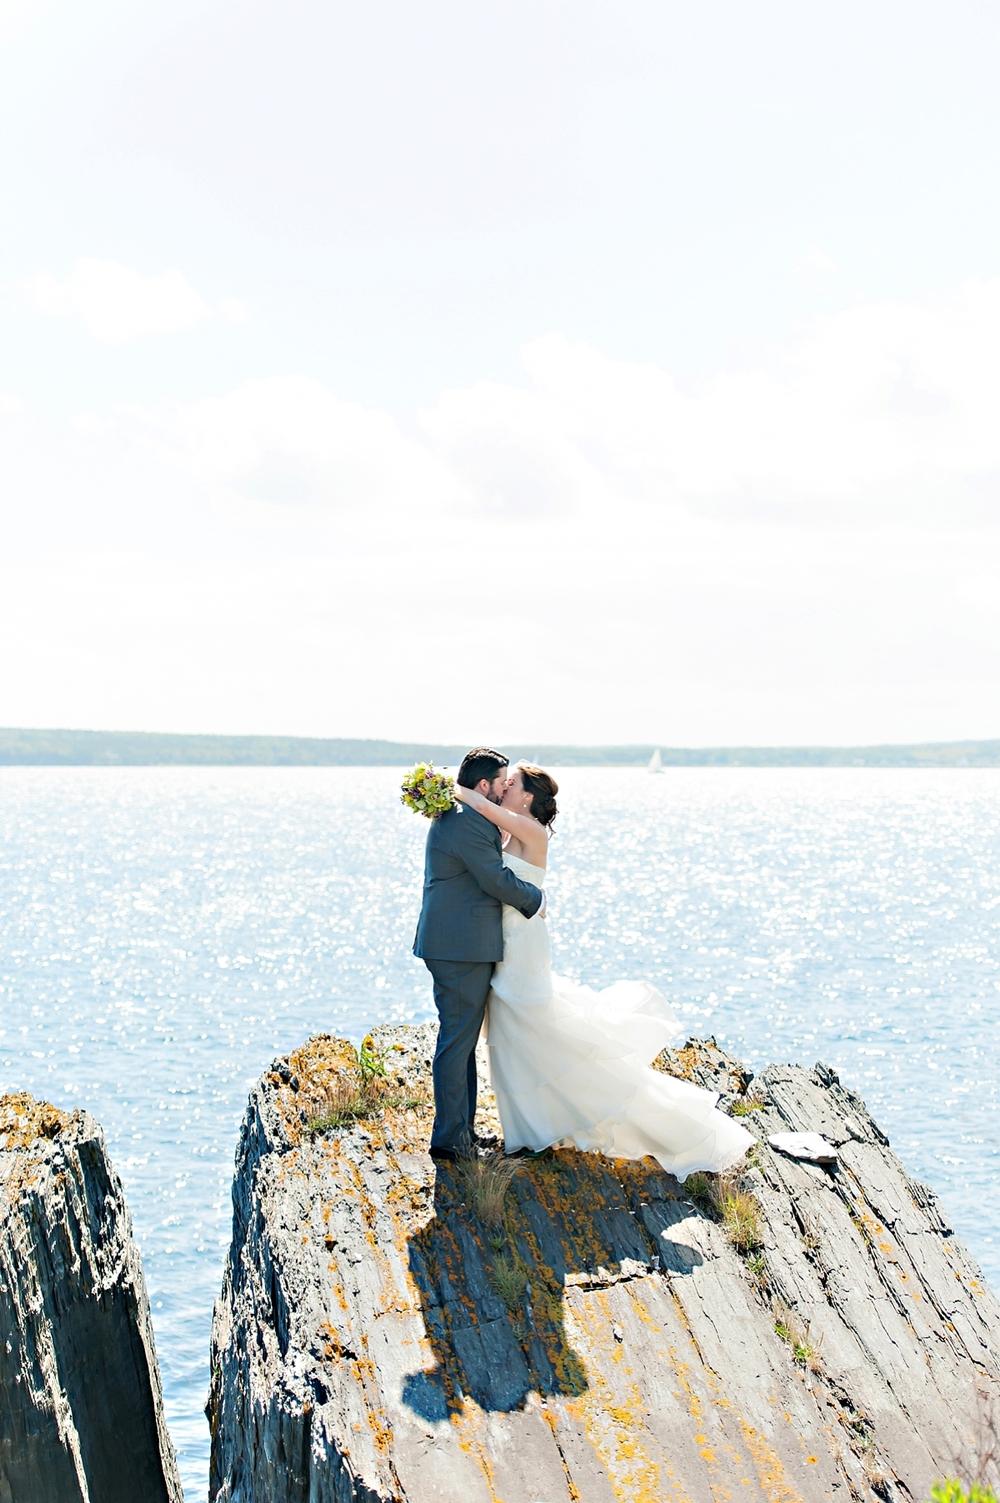 Jamie-Christians-Coastal-Lunenburg-Wedding-Nova-Scotia-Wedding-Photography051.jpg